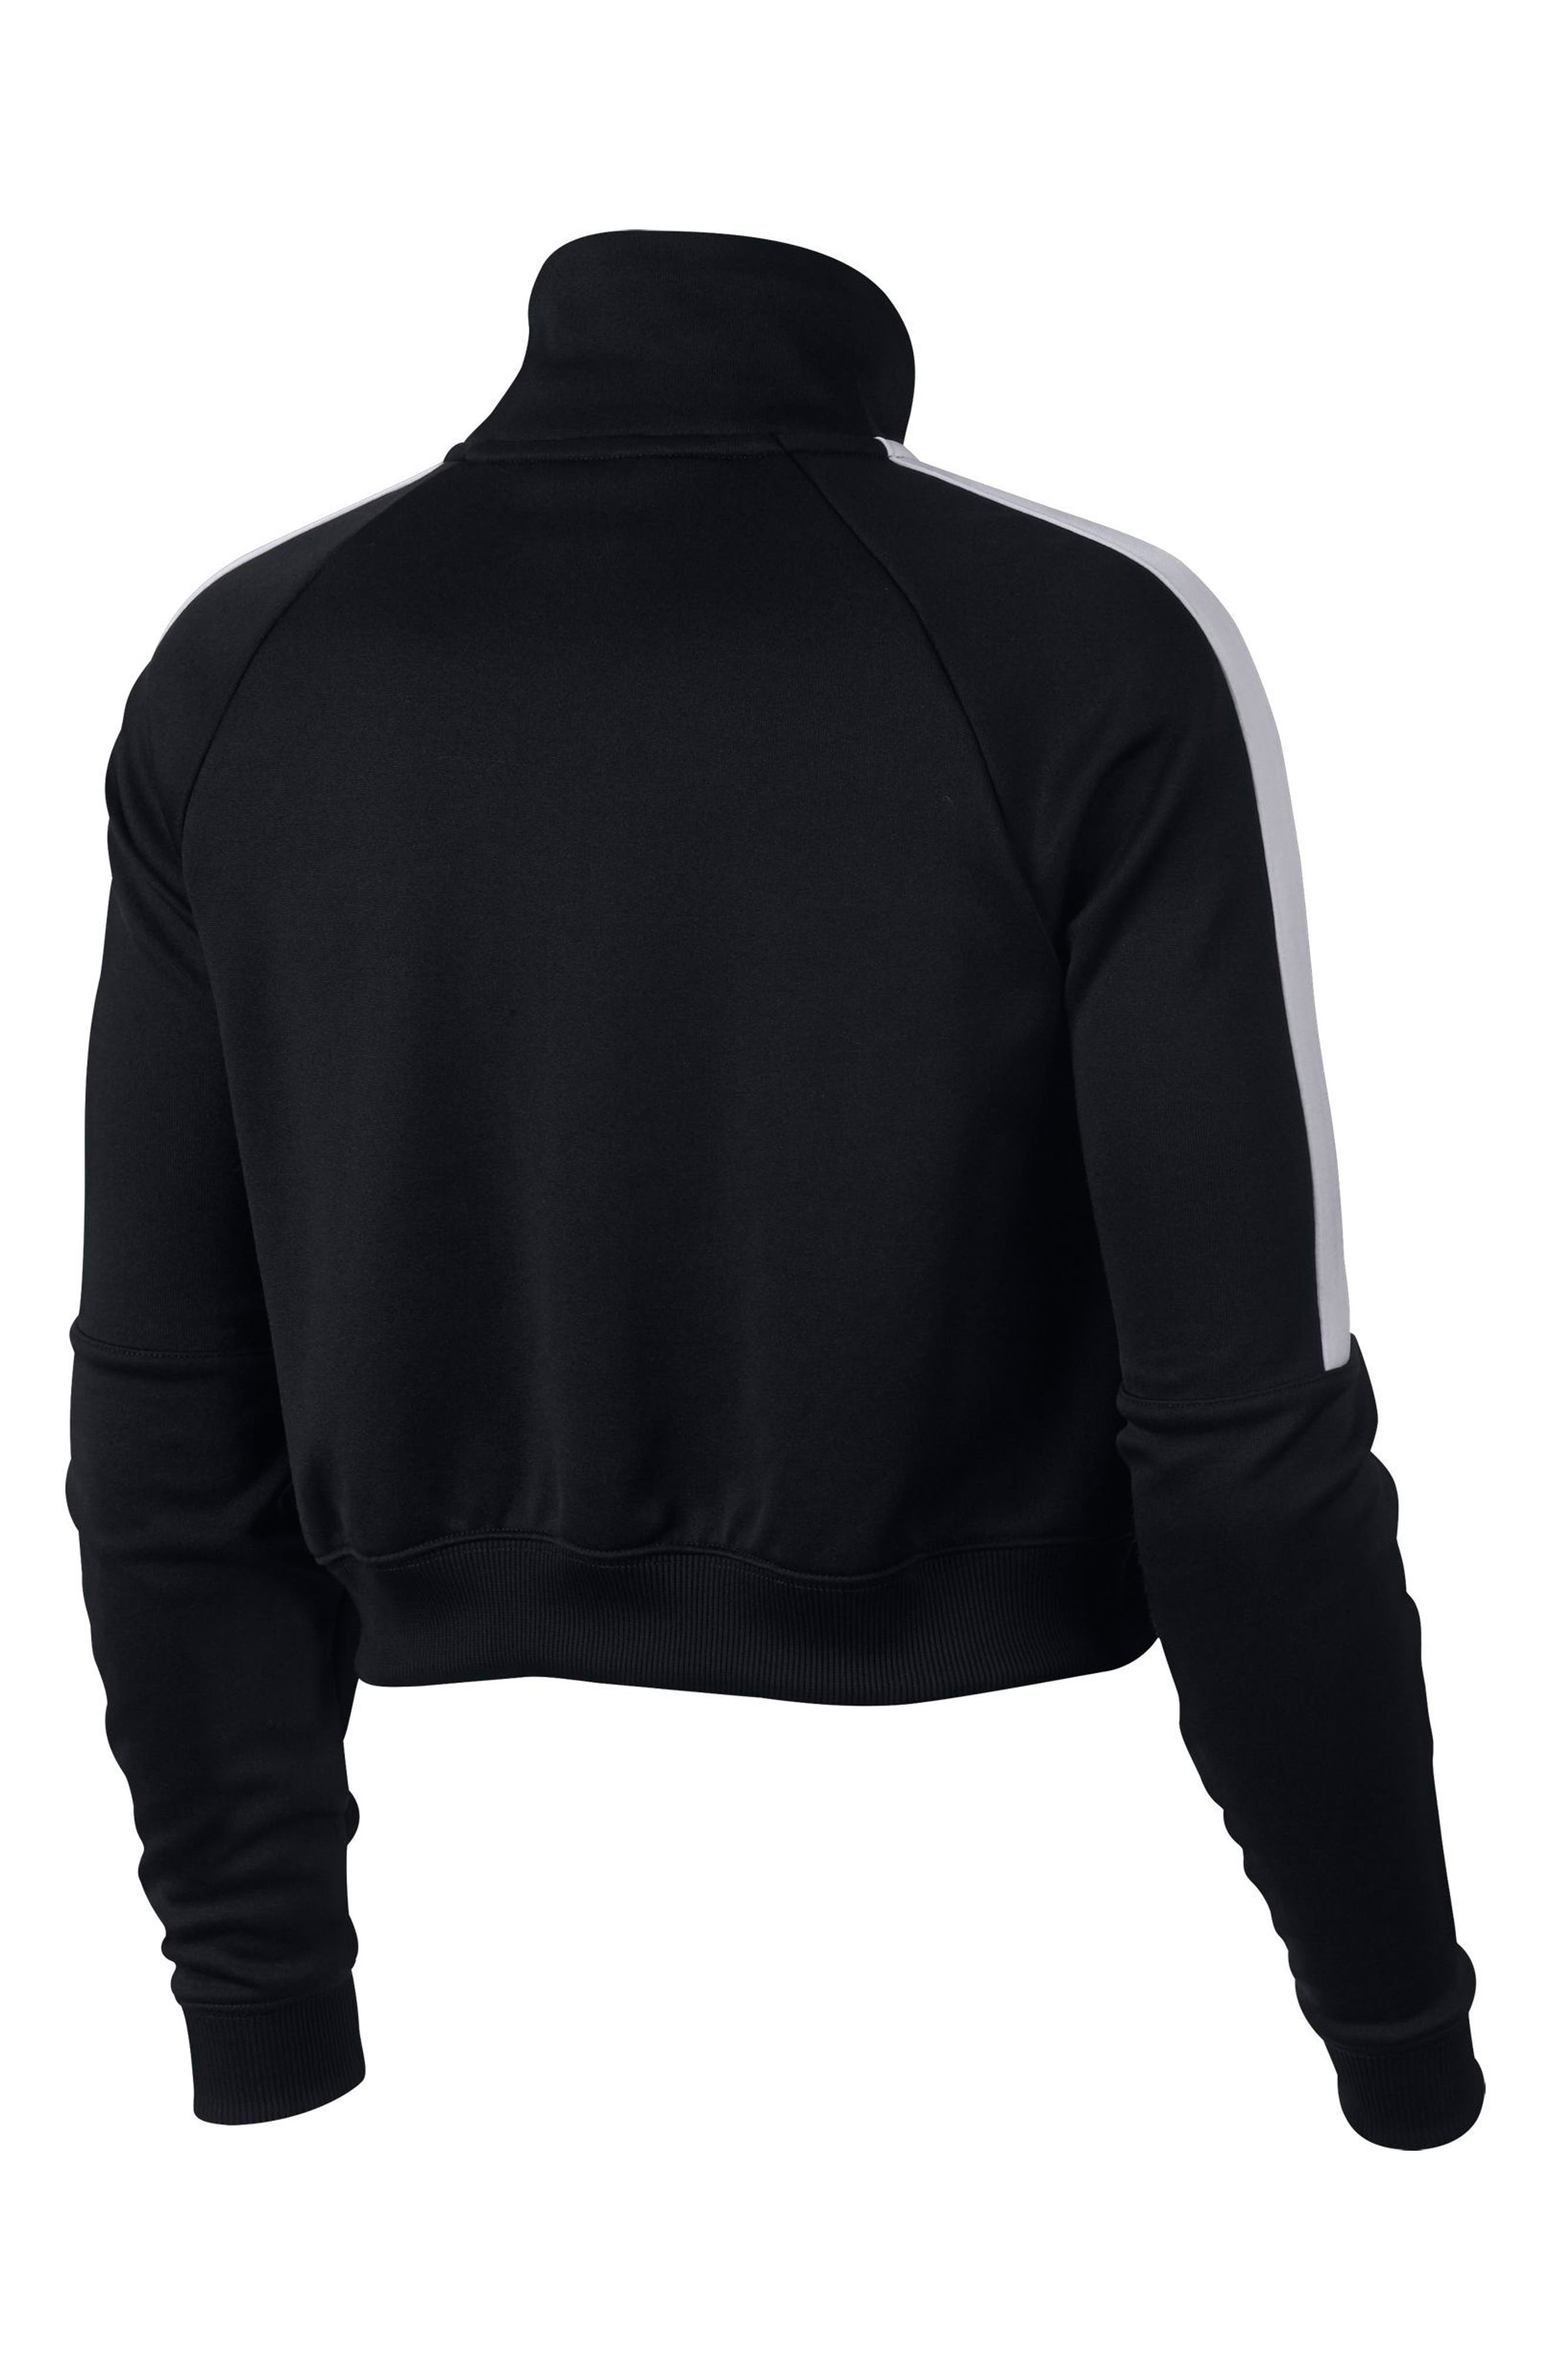 Sportswear N98 Jacket,                             Alternate thumbnail 8, color,                             010